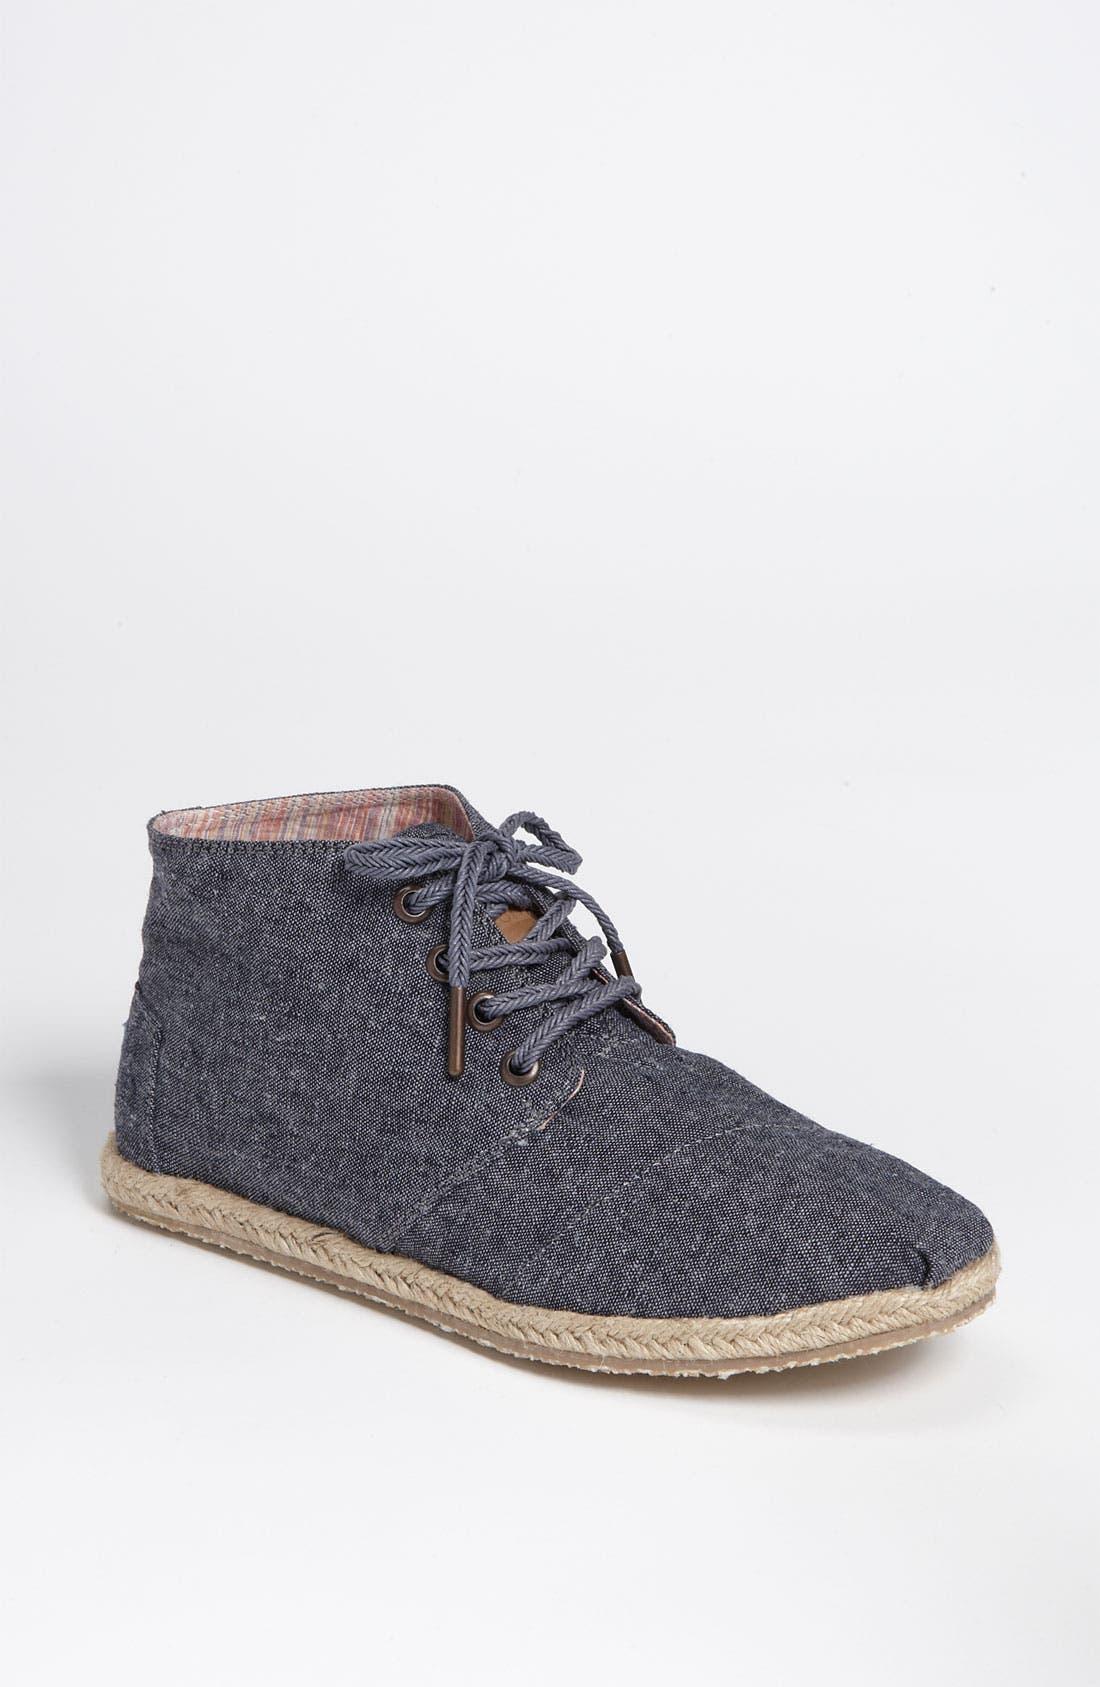 Main Image - TOMS 'Botas Desert - Bristol' Boot (Women)